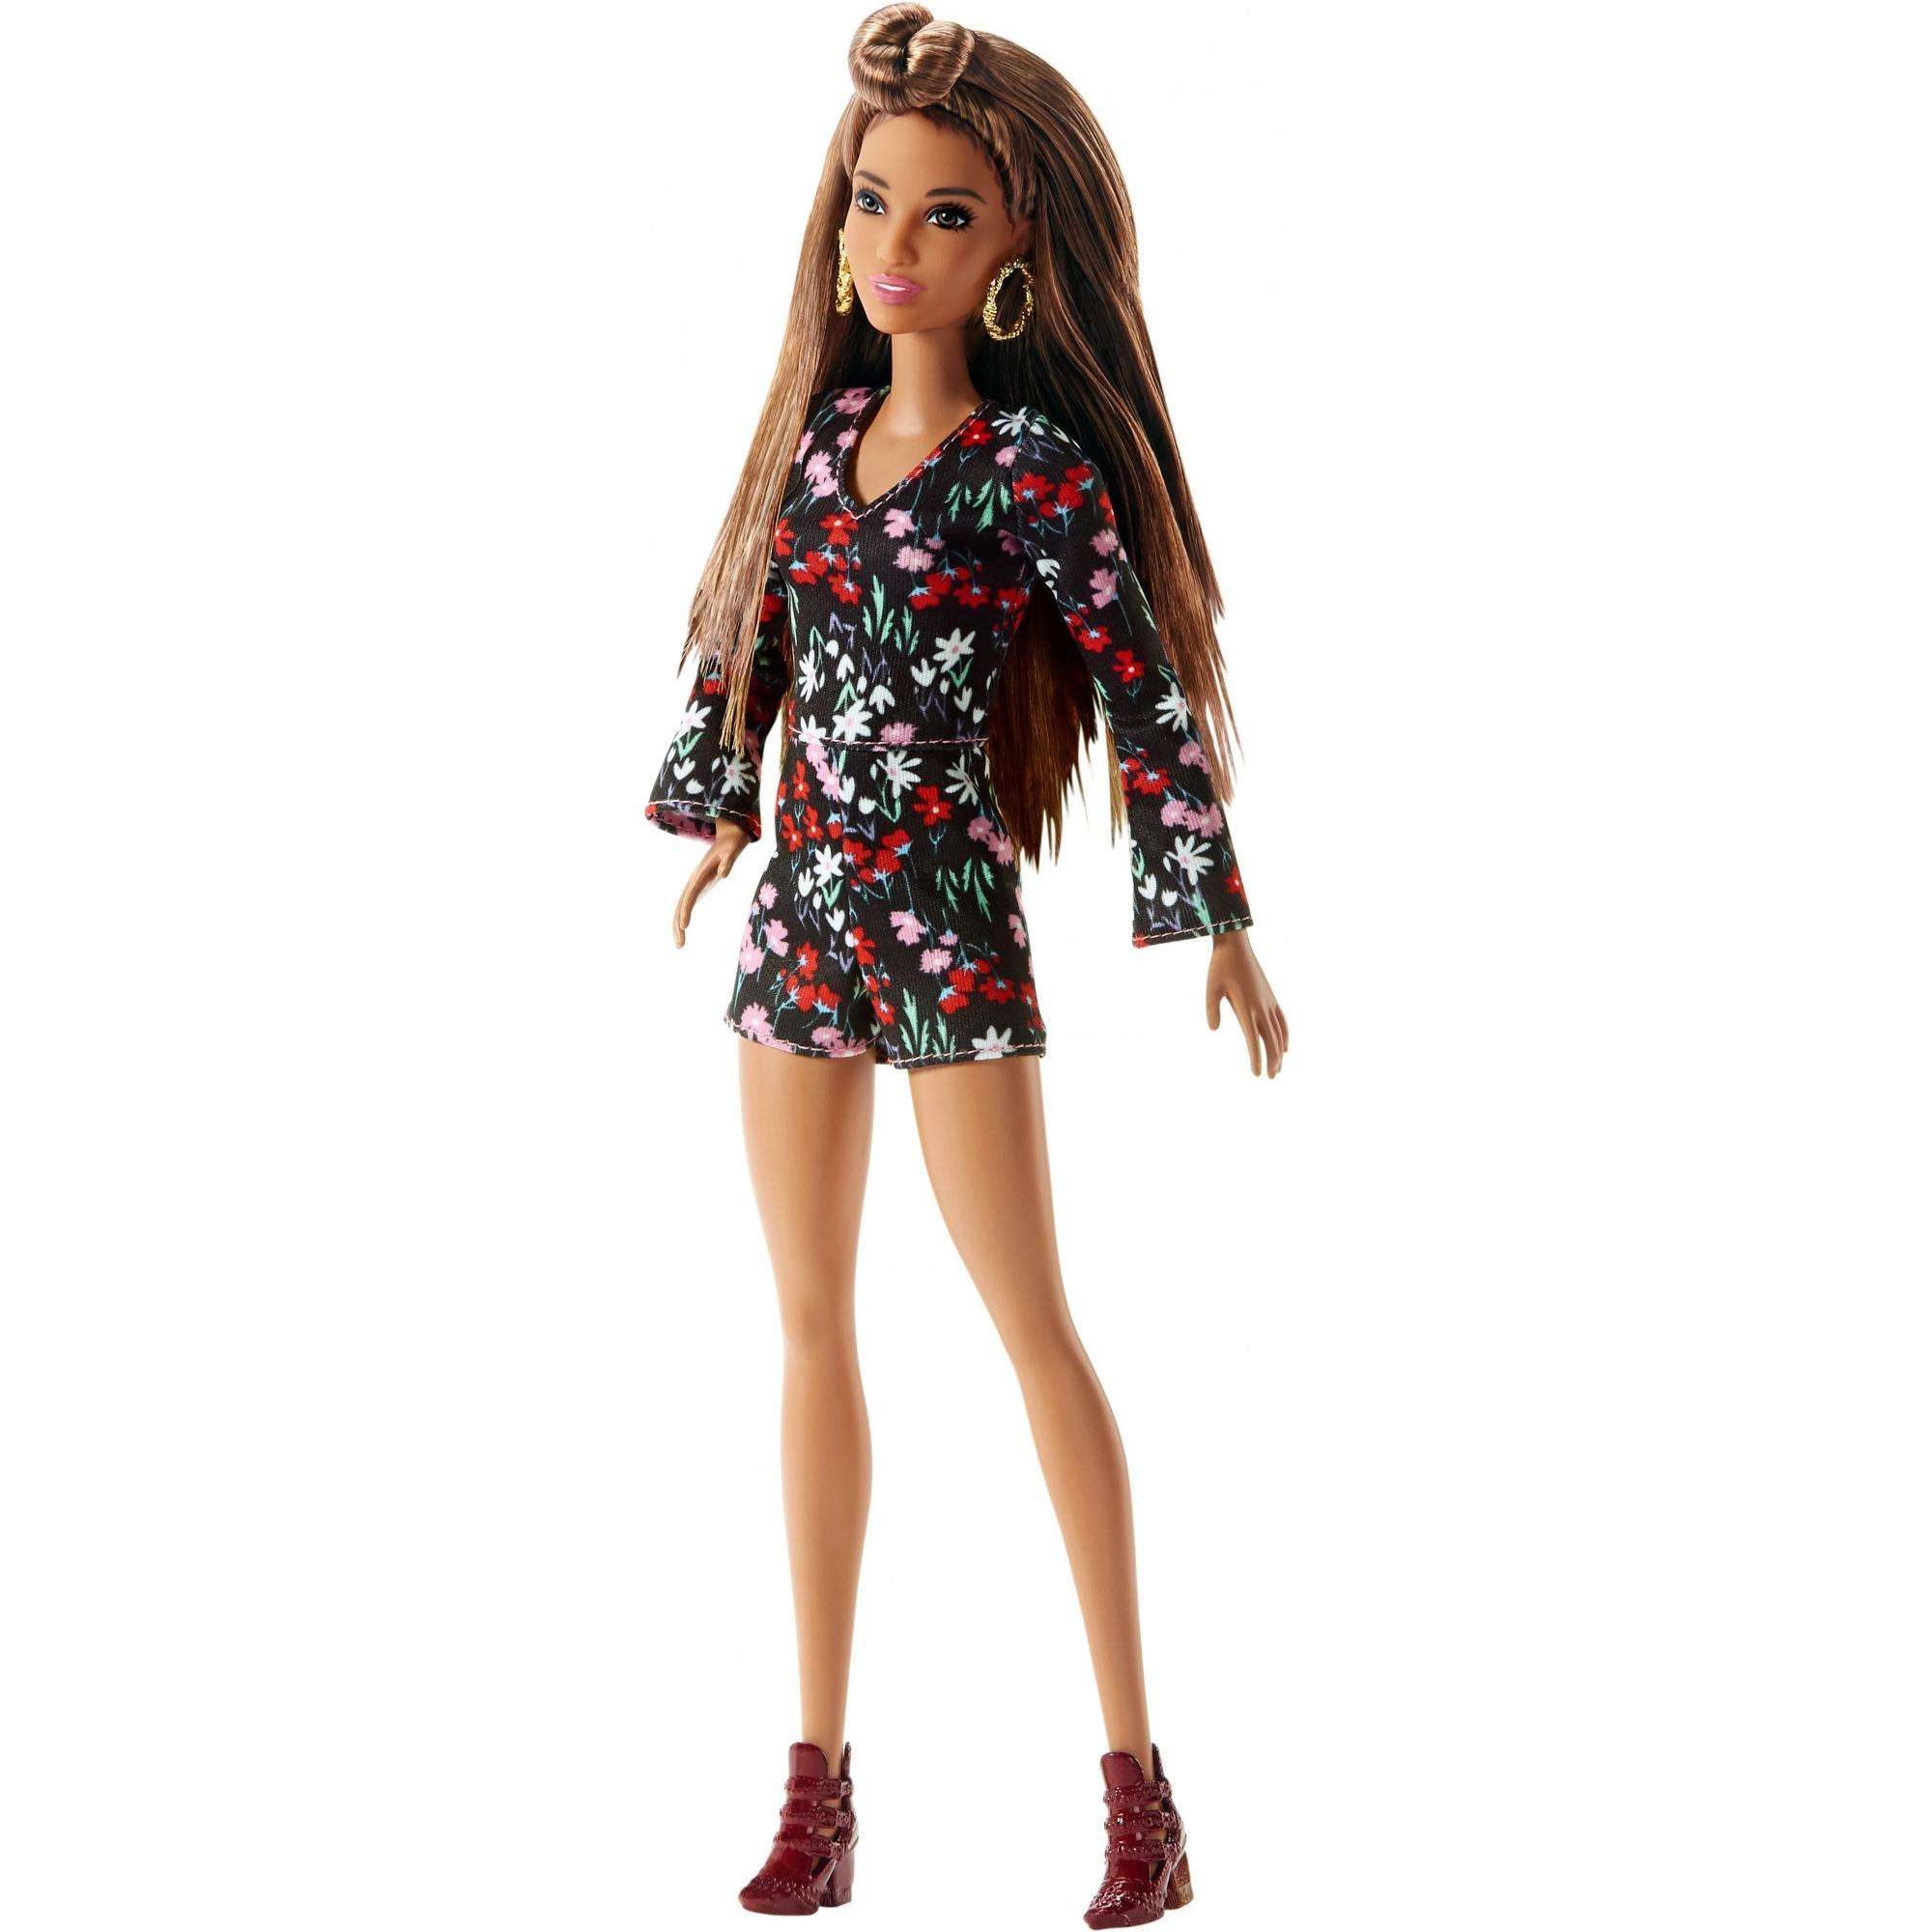 Barbie Fashionistas Doll Rosey Romper by Mattel